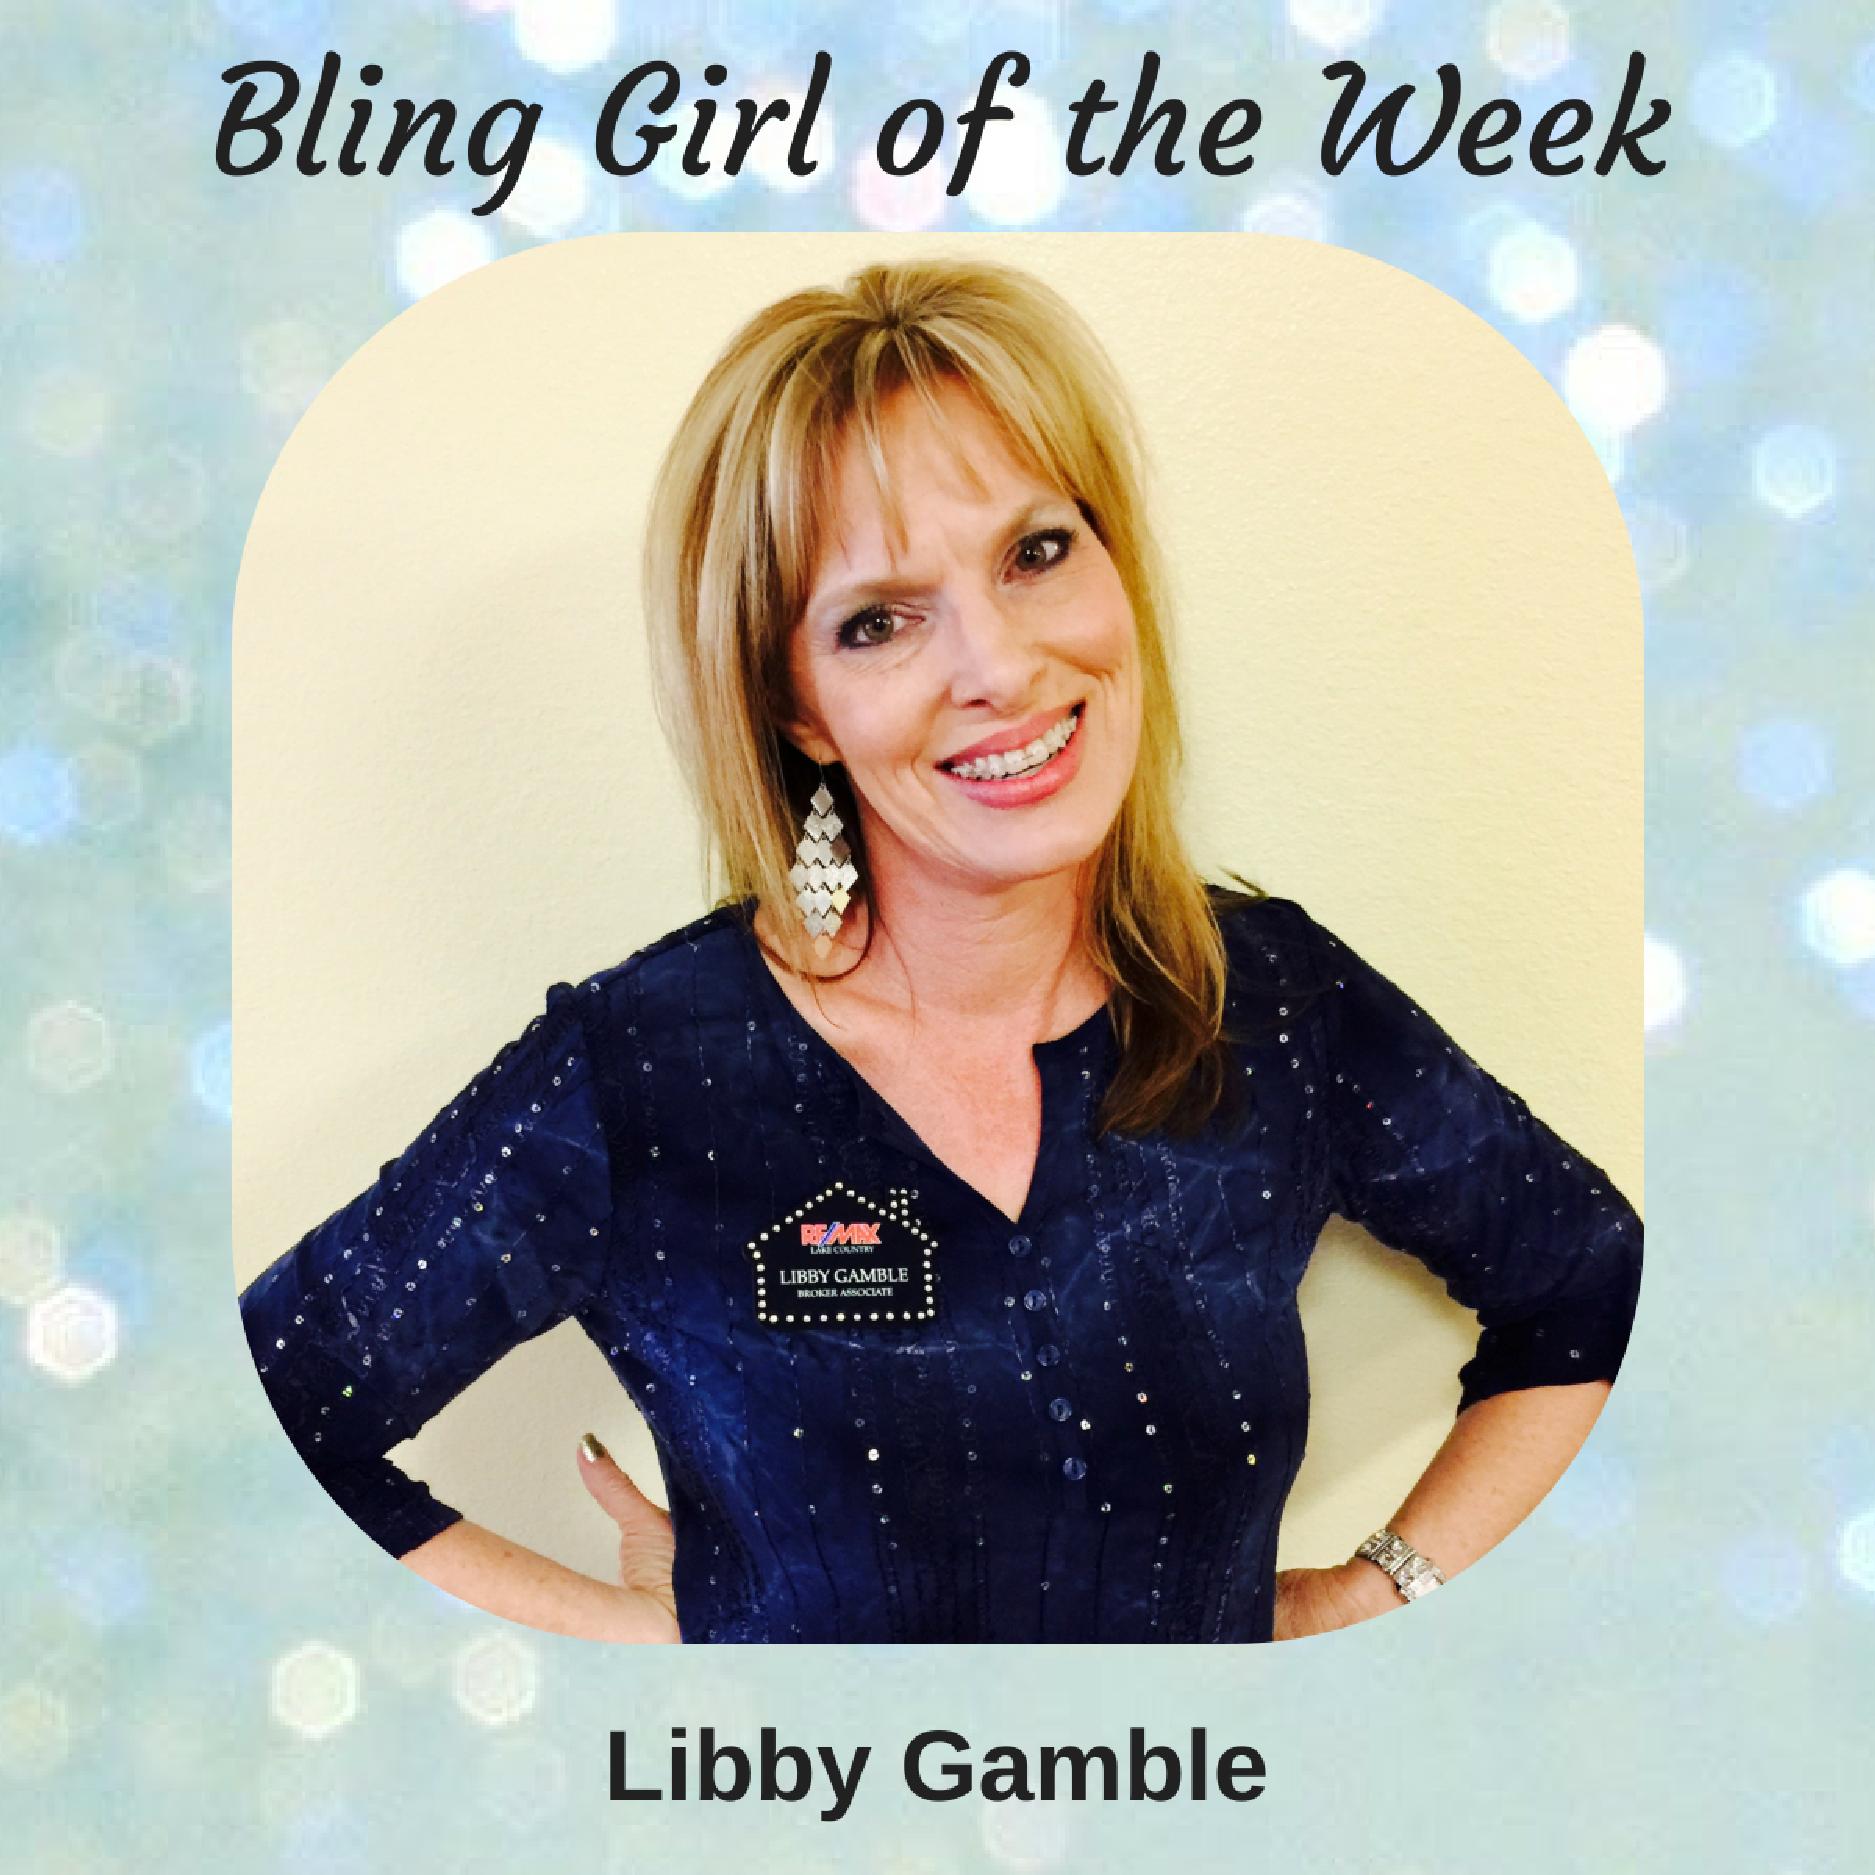 Libby Gamble